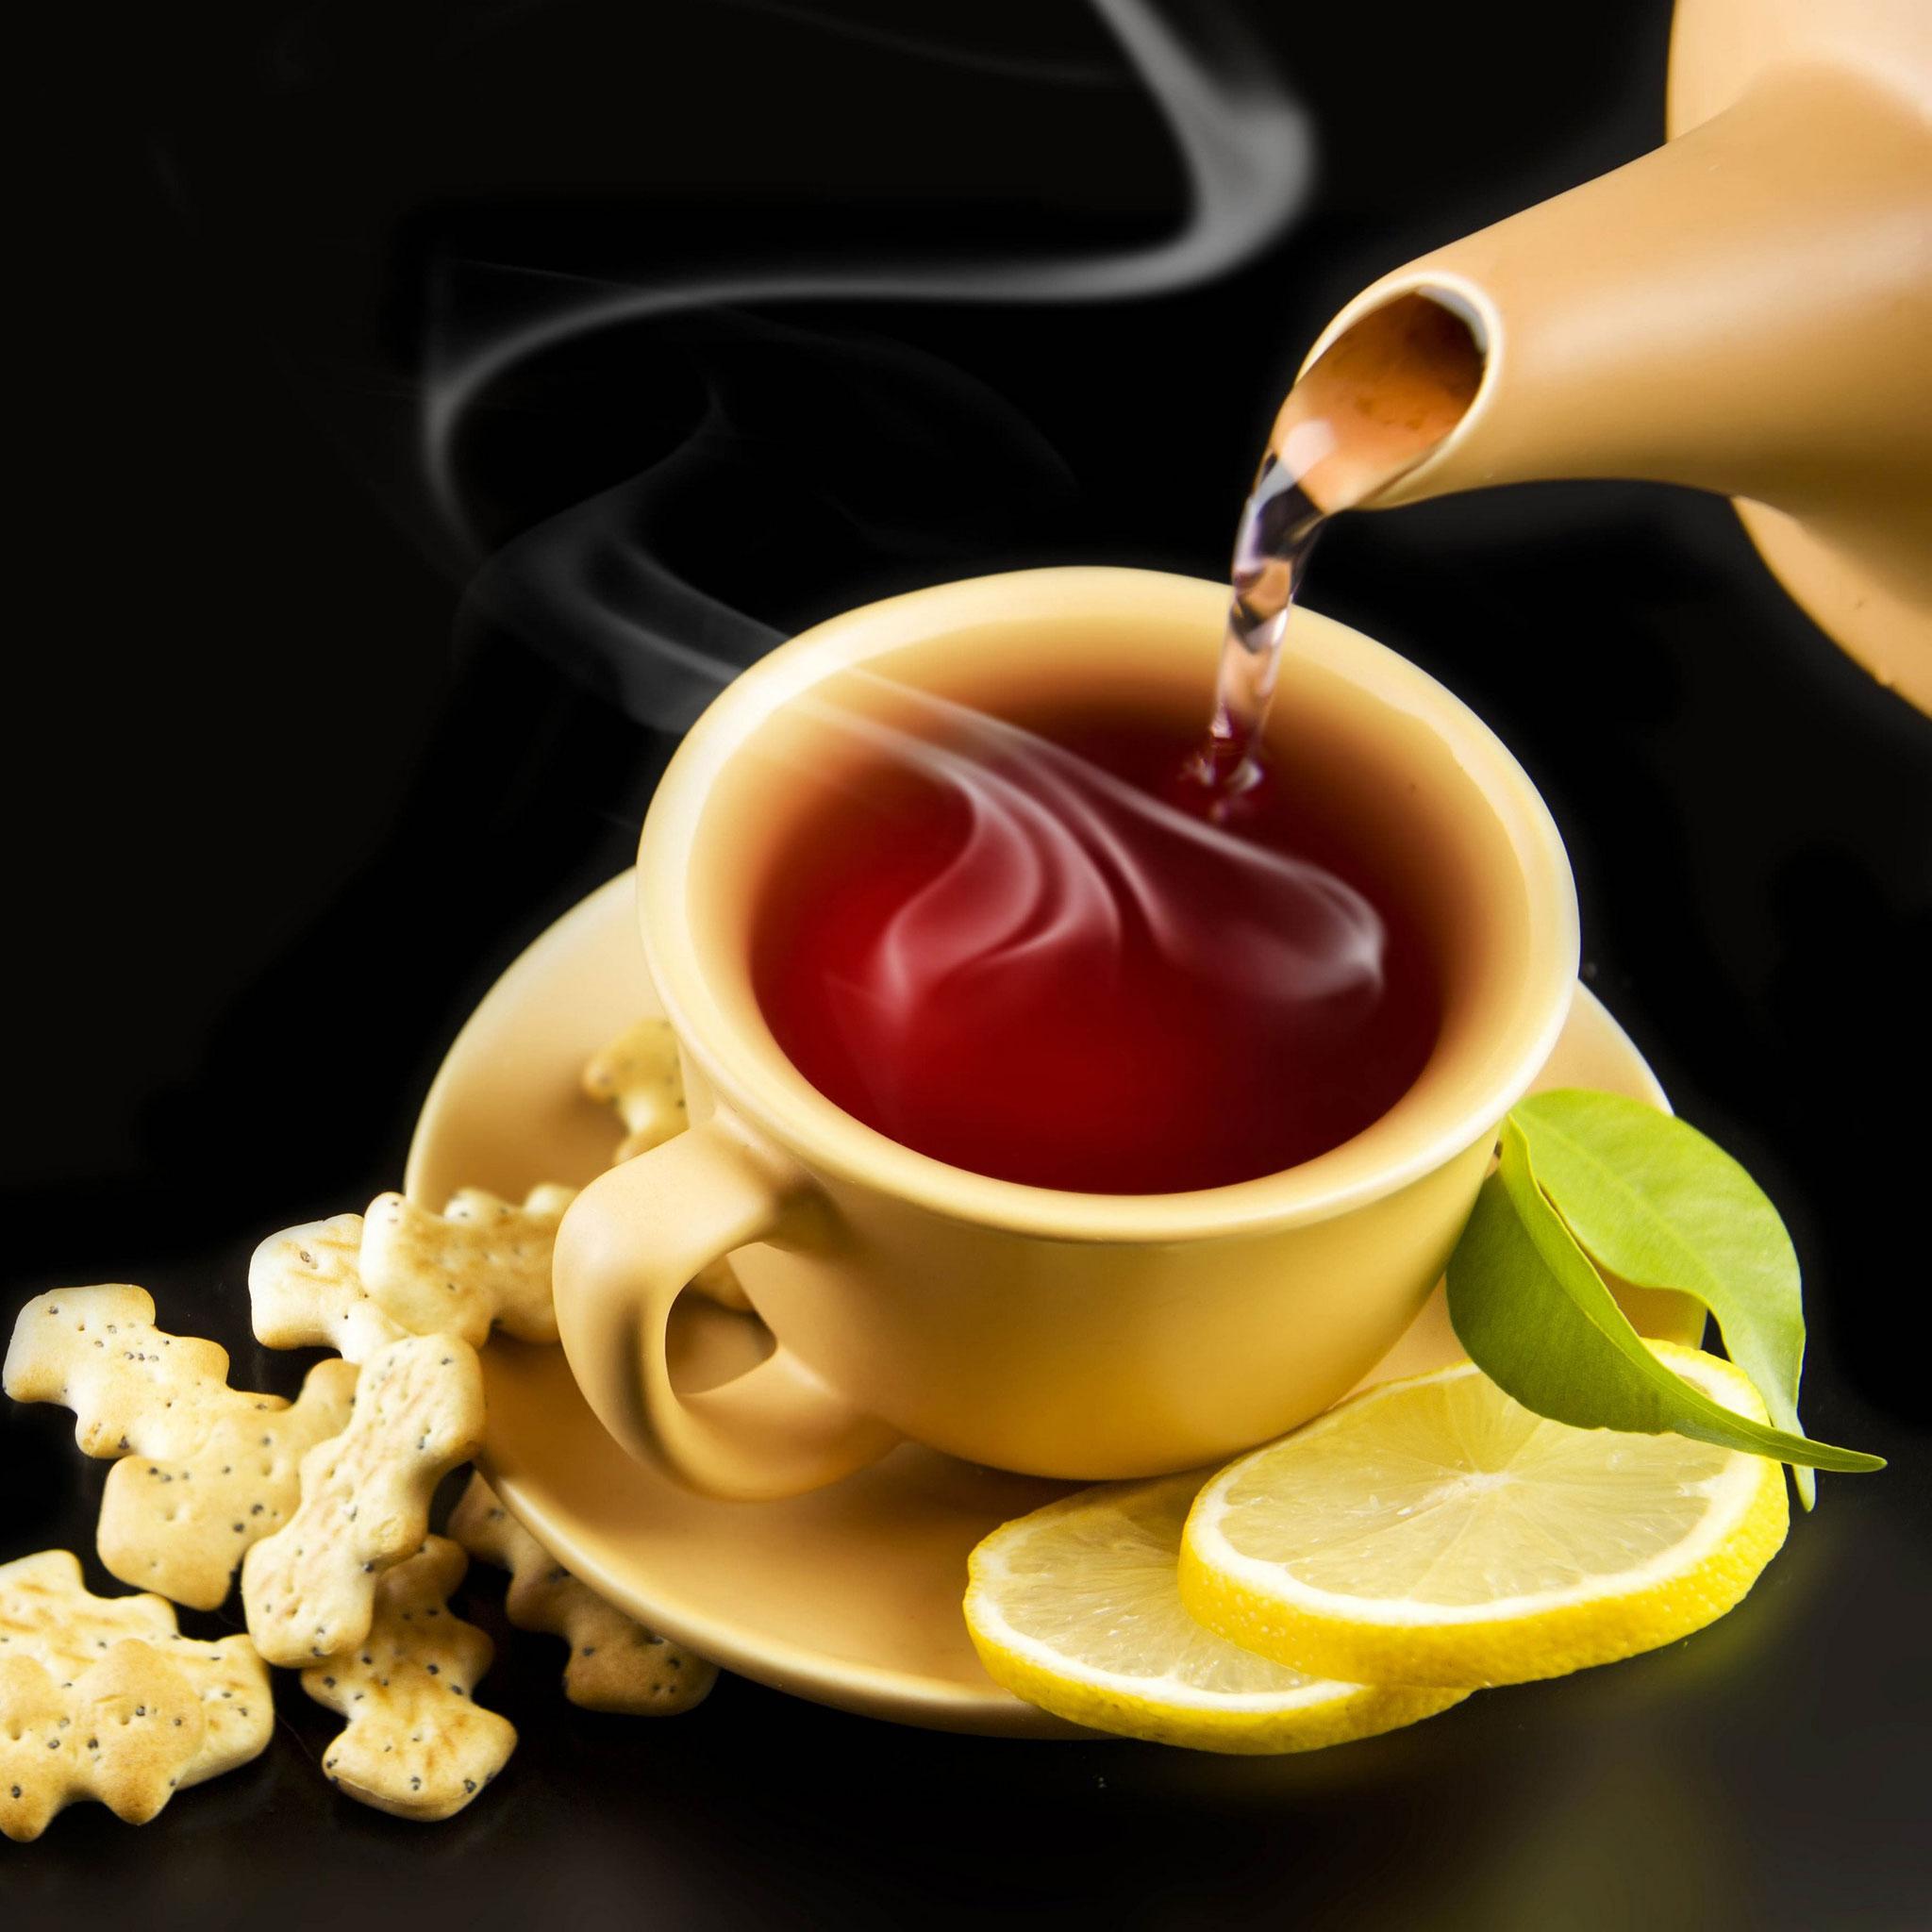 Cup of Tea 3Wallpapers iPad Retina Cup of Tea   iPad Retina